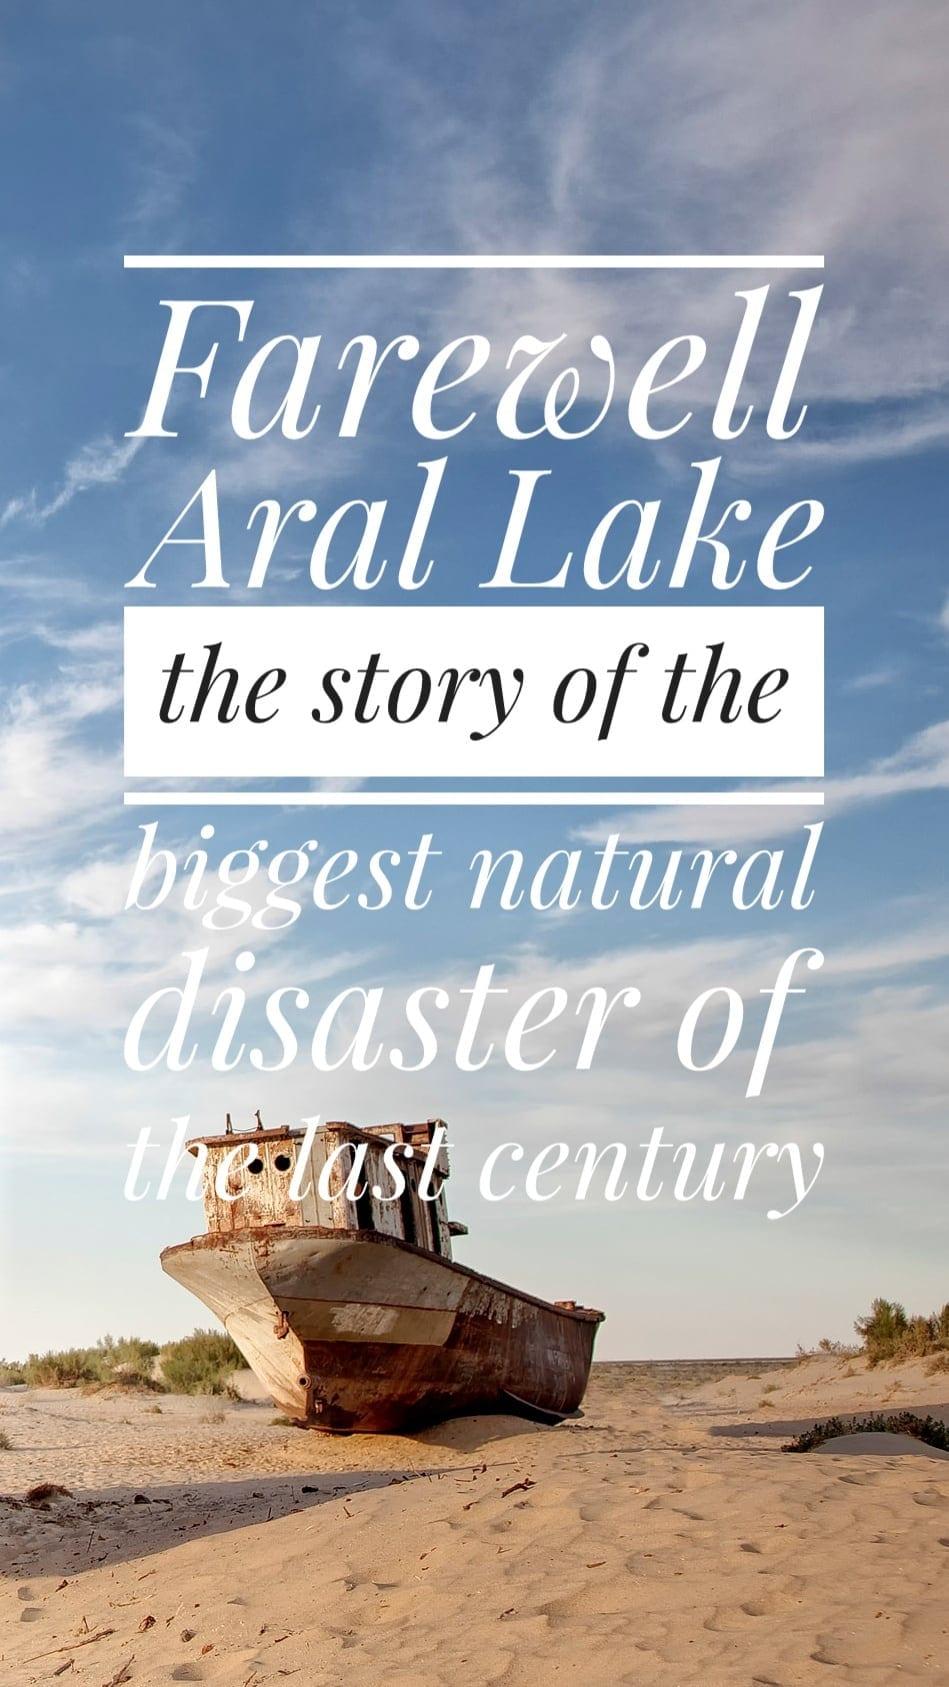 Aral Sea disaster